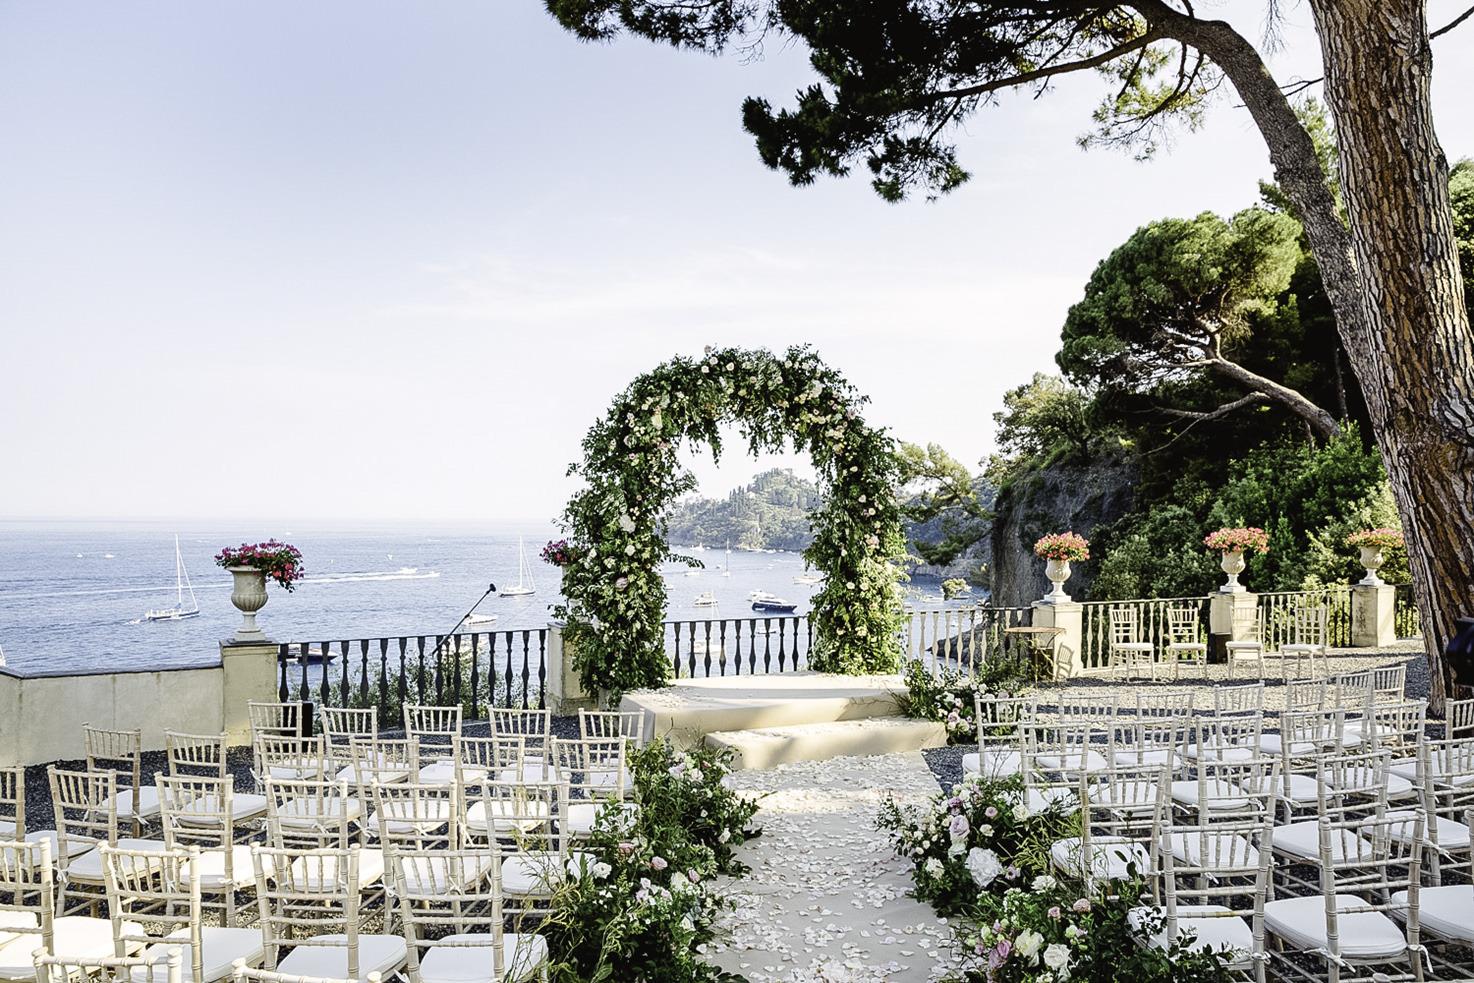 Wedding ceremony on a terrace at La Cervara